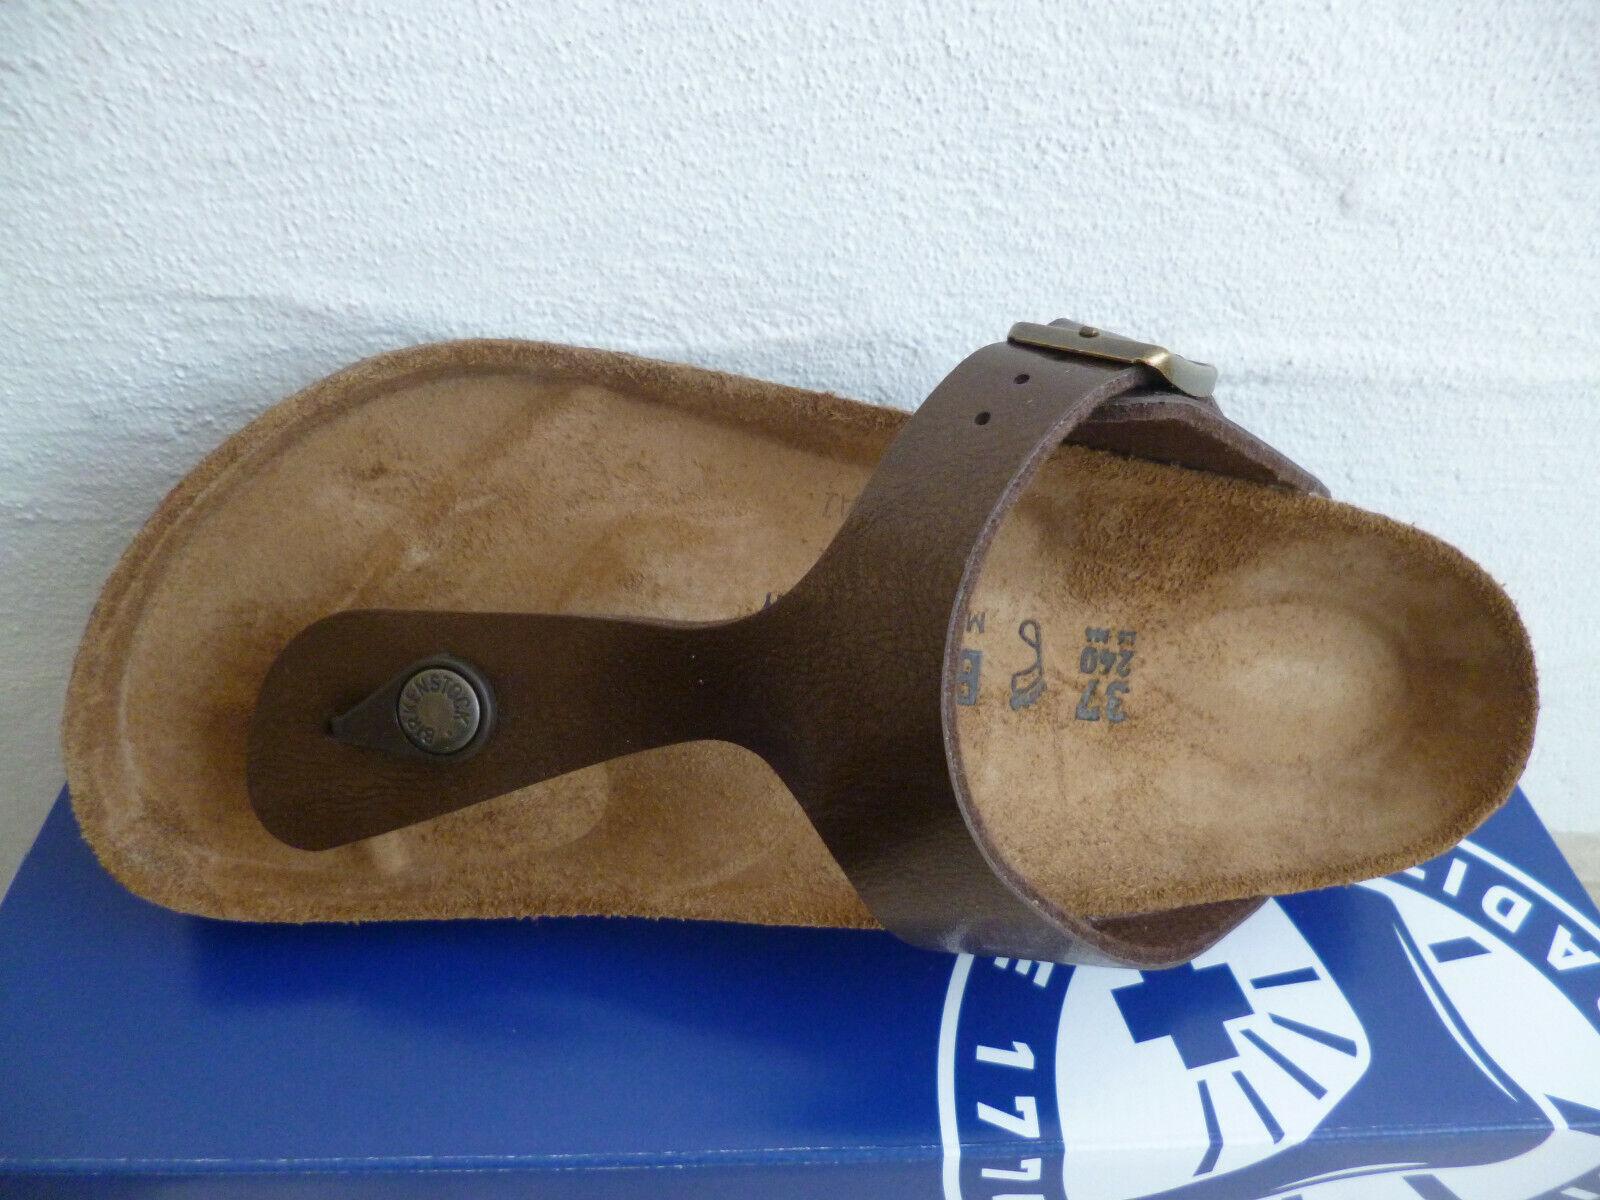 Birkenstock Gizeh Zehen Trenner Pantolette Sandale Toffee Braun 0845221 NEU!